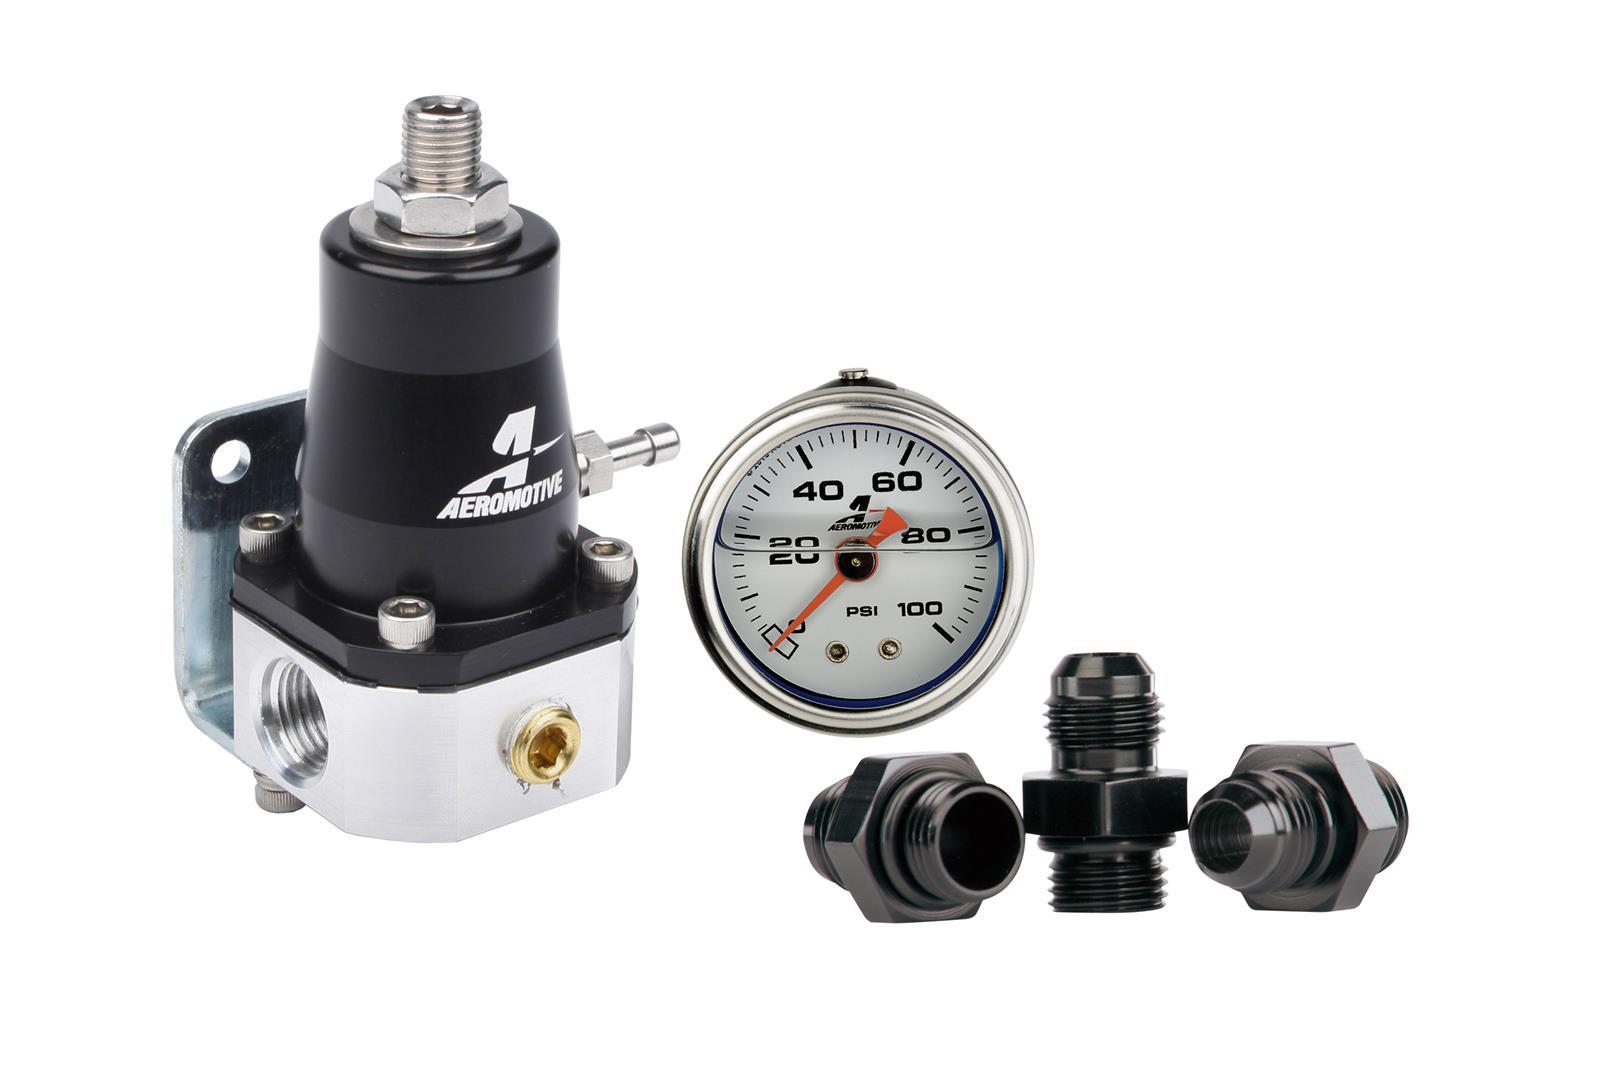 Mostbest Universal Aluminum Adjustable Aero 13130 30-70Psi Fuel Pressure Regulator Motive Gauge EFI Bypass An6 Fpr